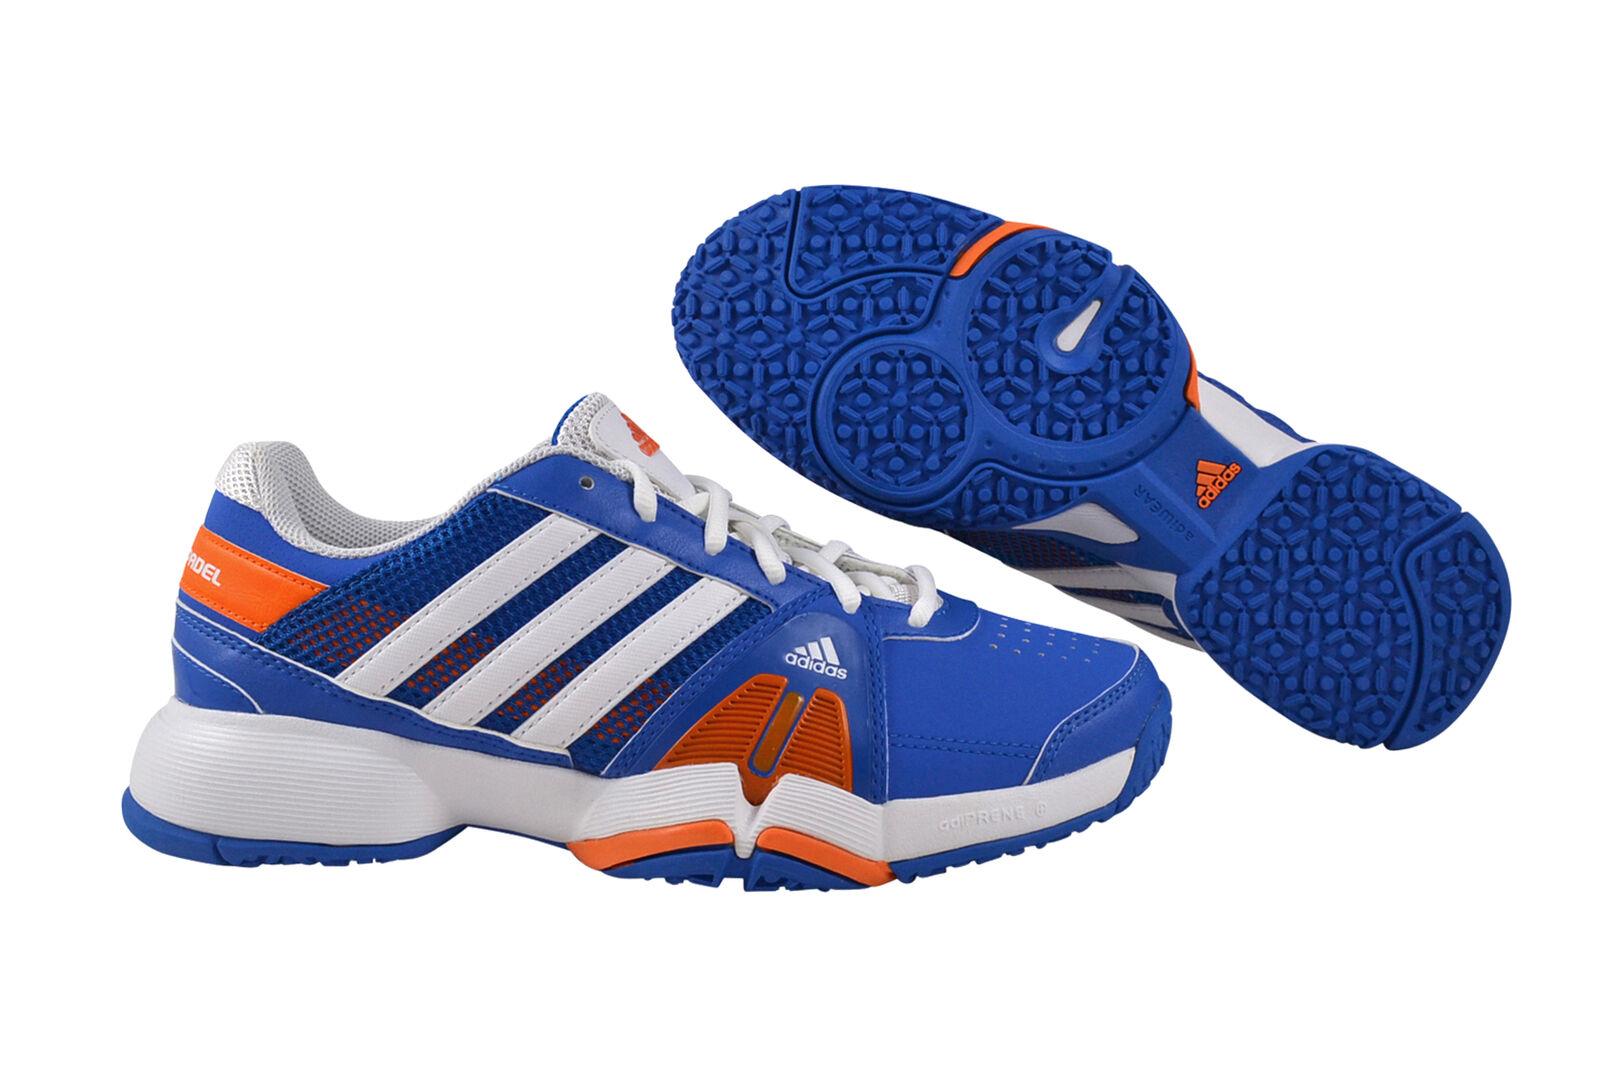 Adidas Barricade Team 3 padel azul blancoo tennizapatos m22483